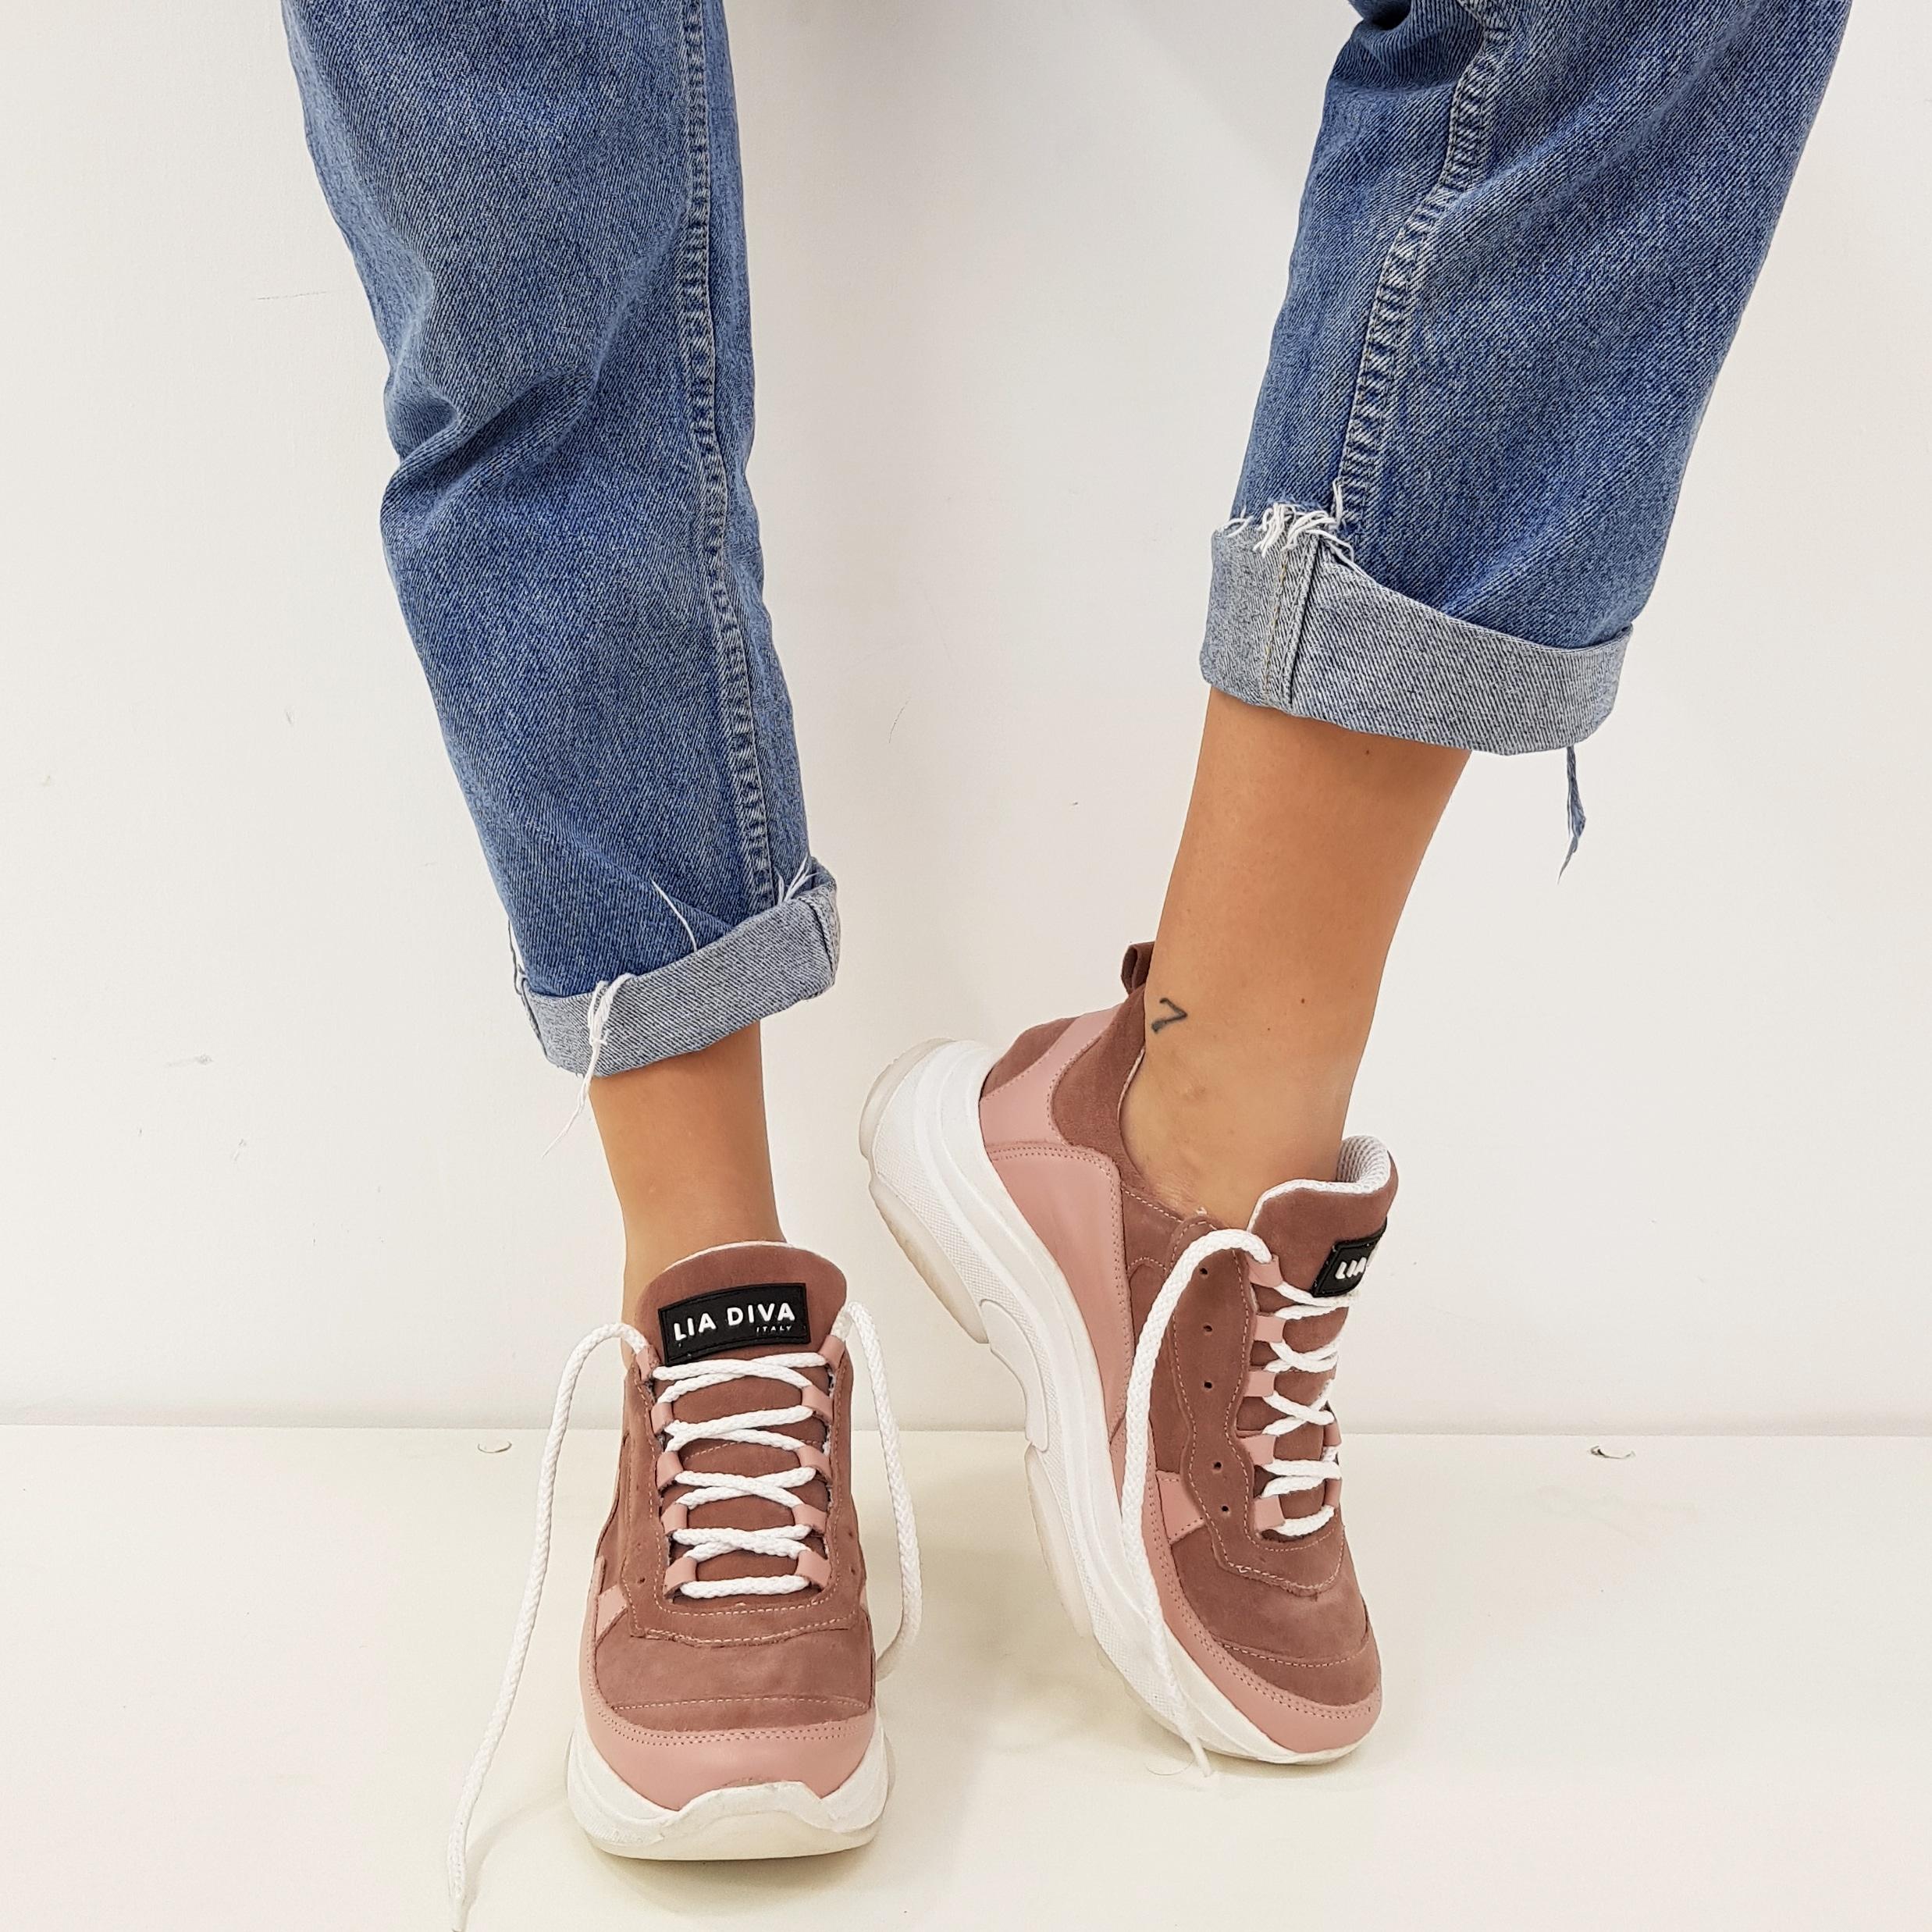 Sneakers lacci rosa kent1 - Lia diva scarpe ...